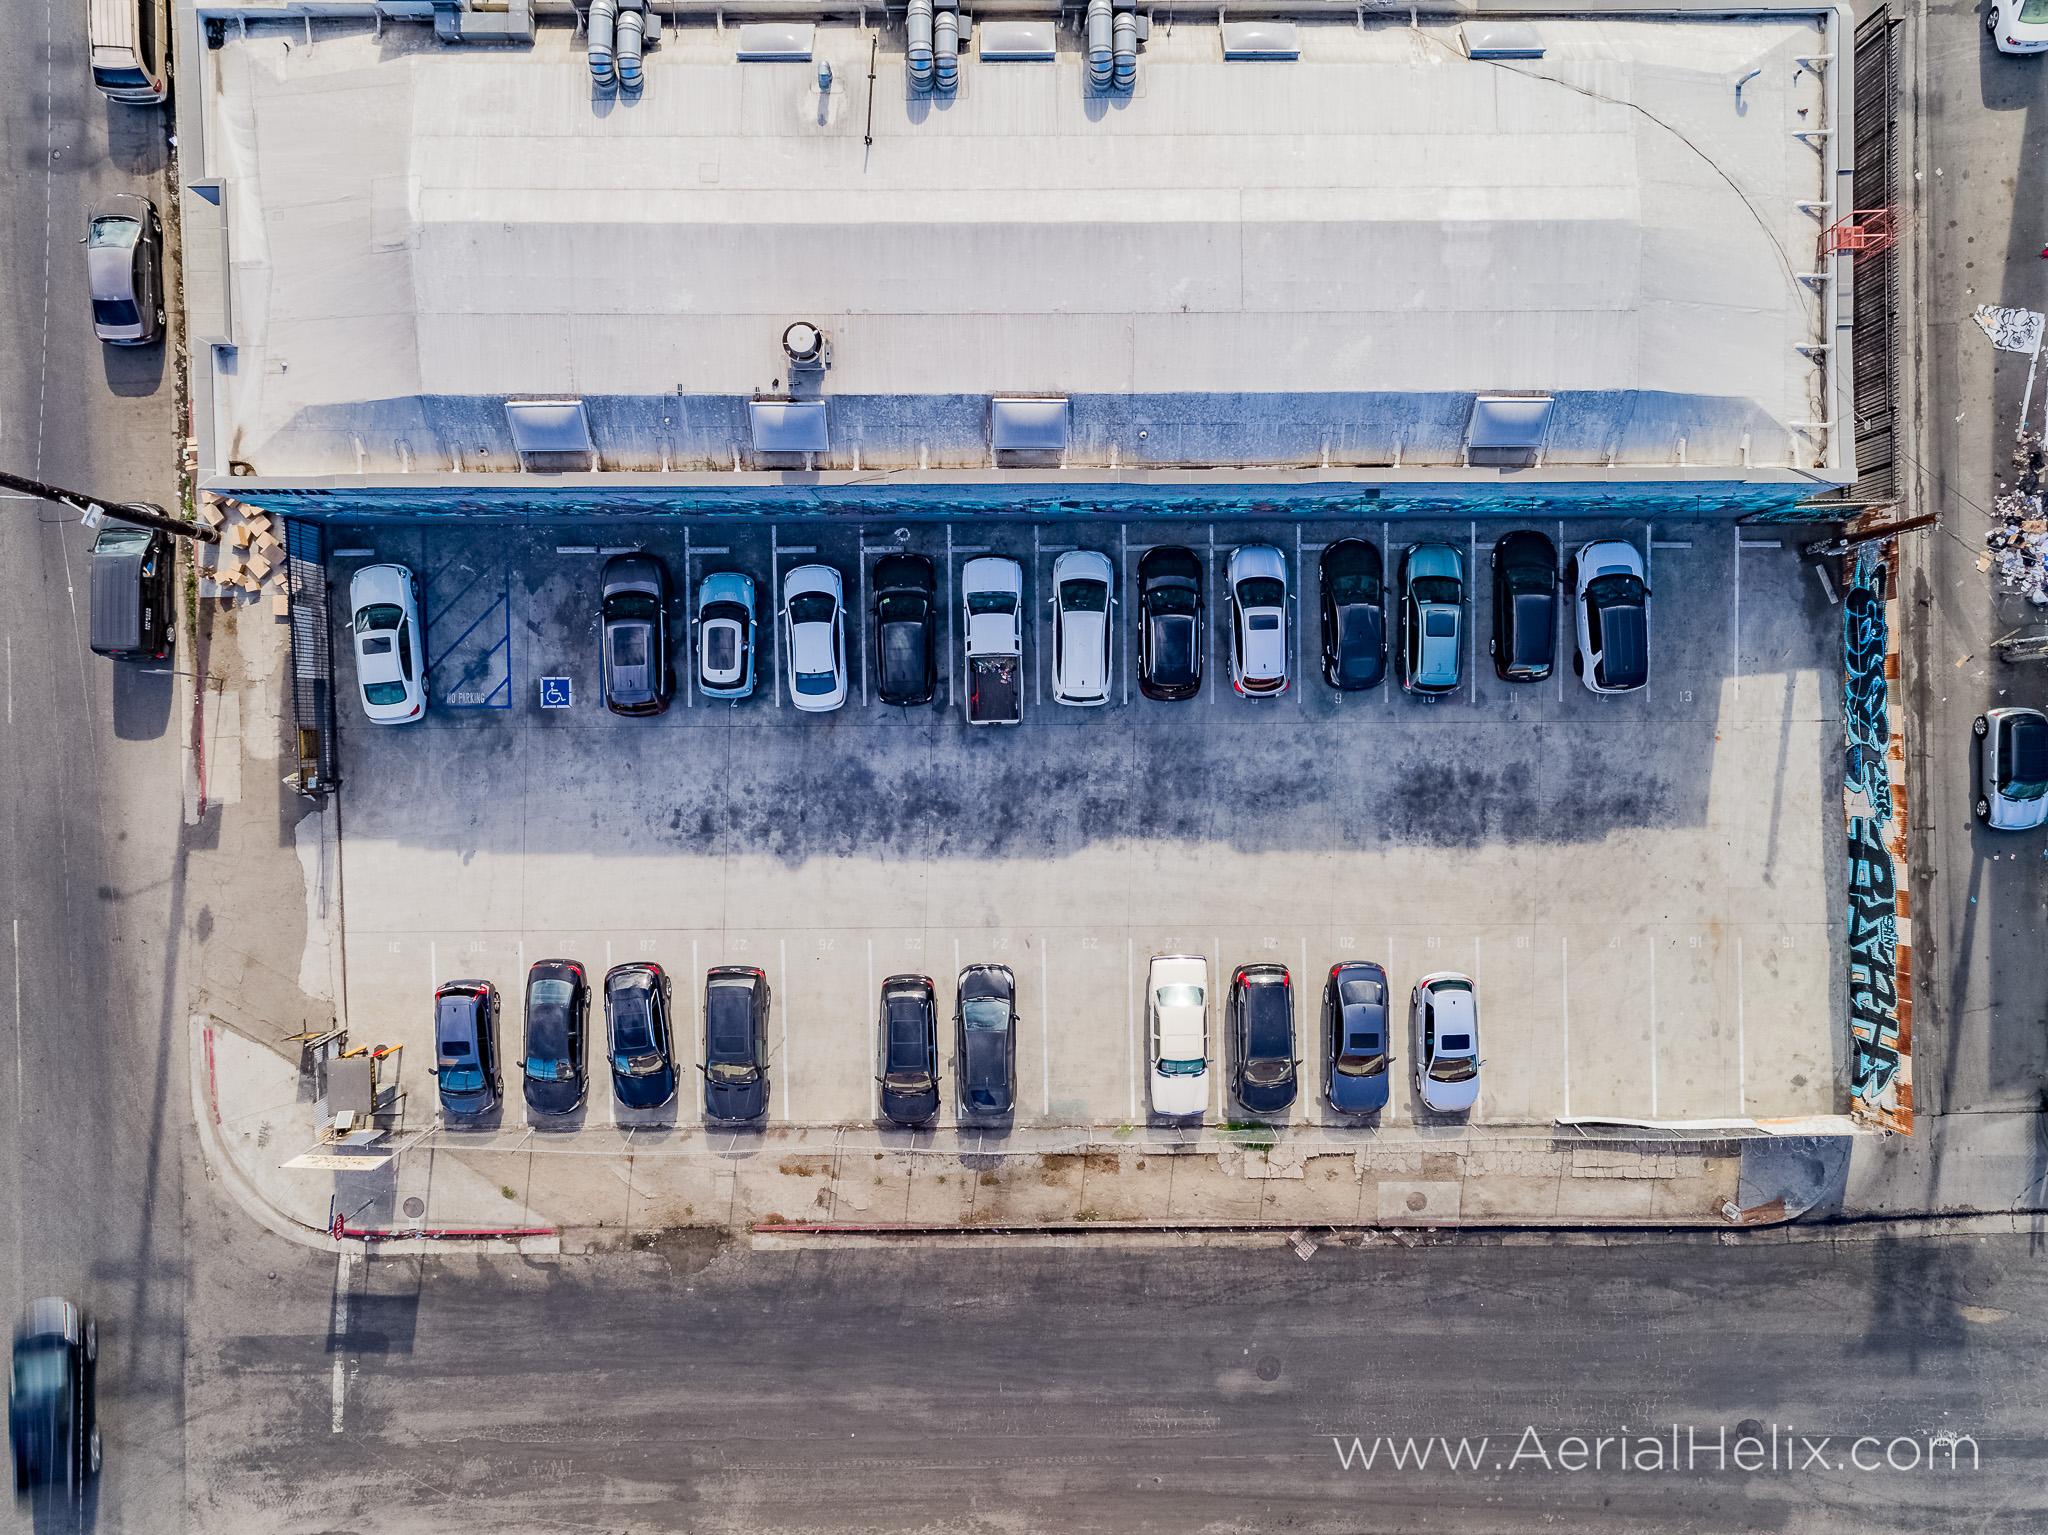 Perfect Parking 2 aerial photographer-31.jpg